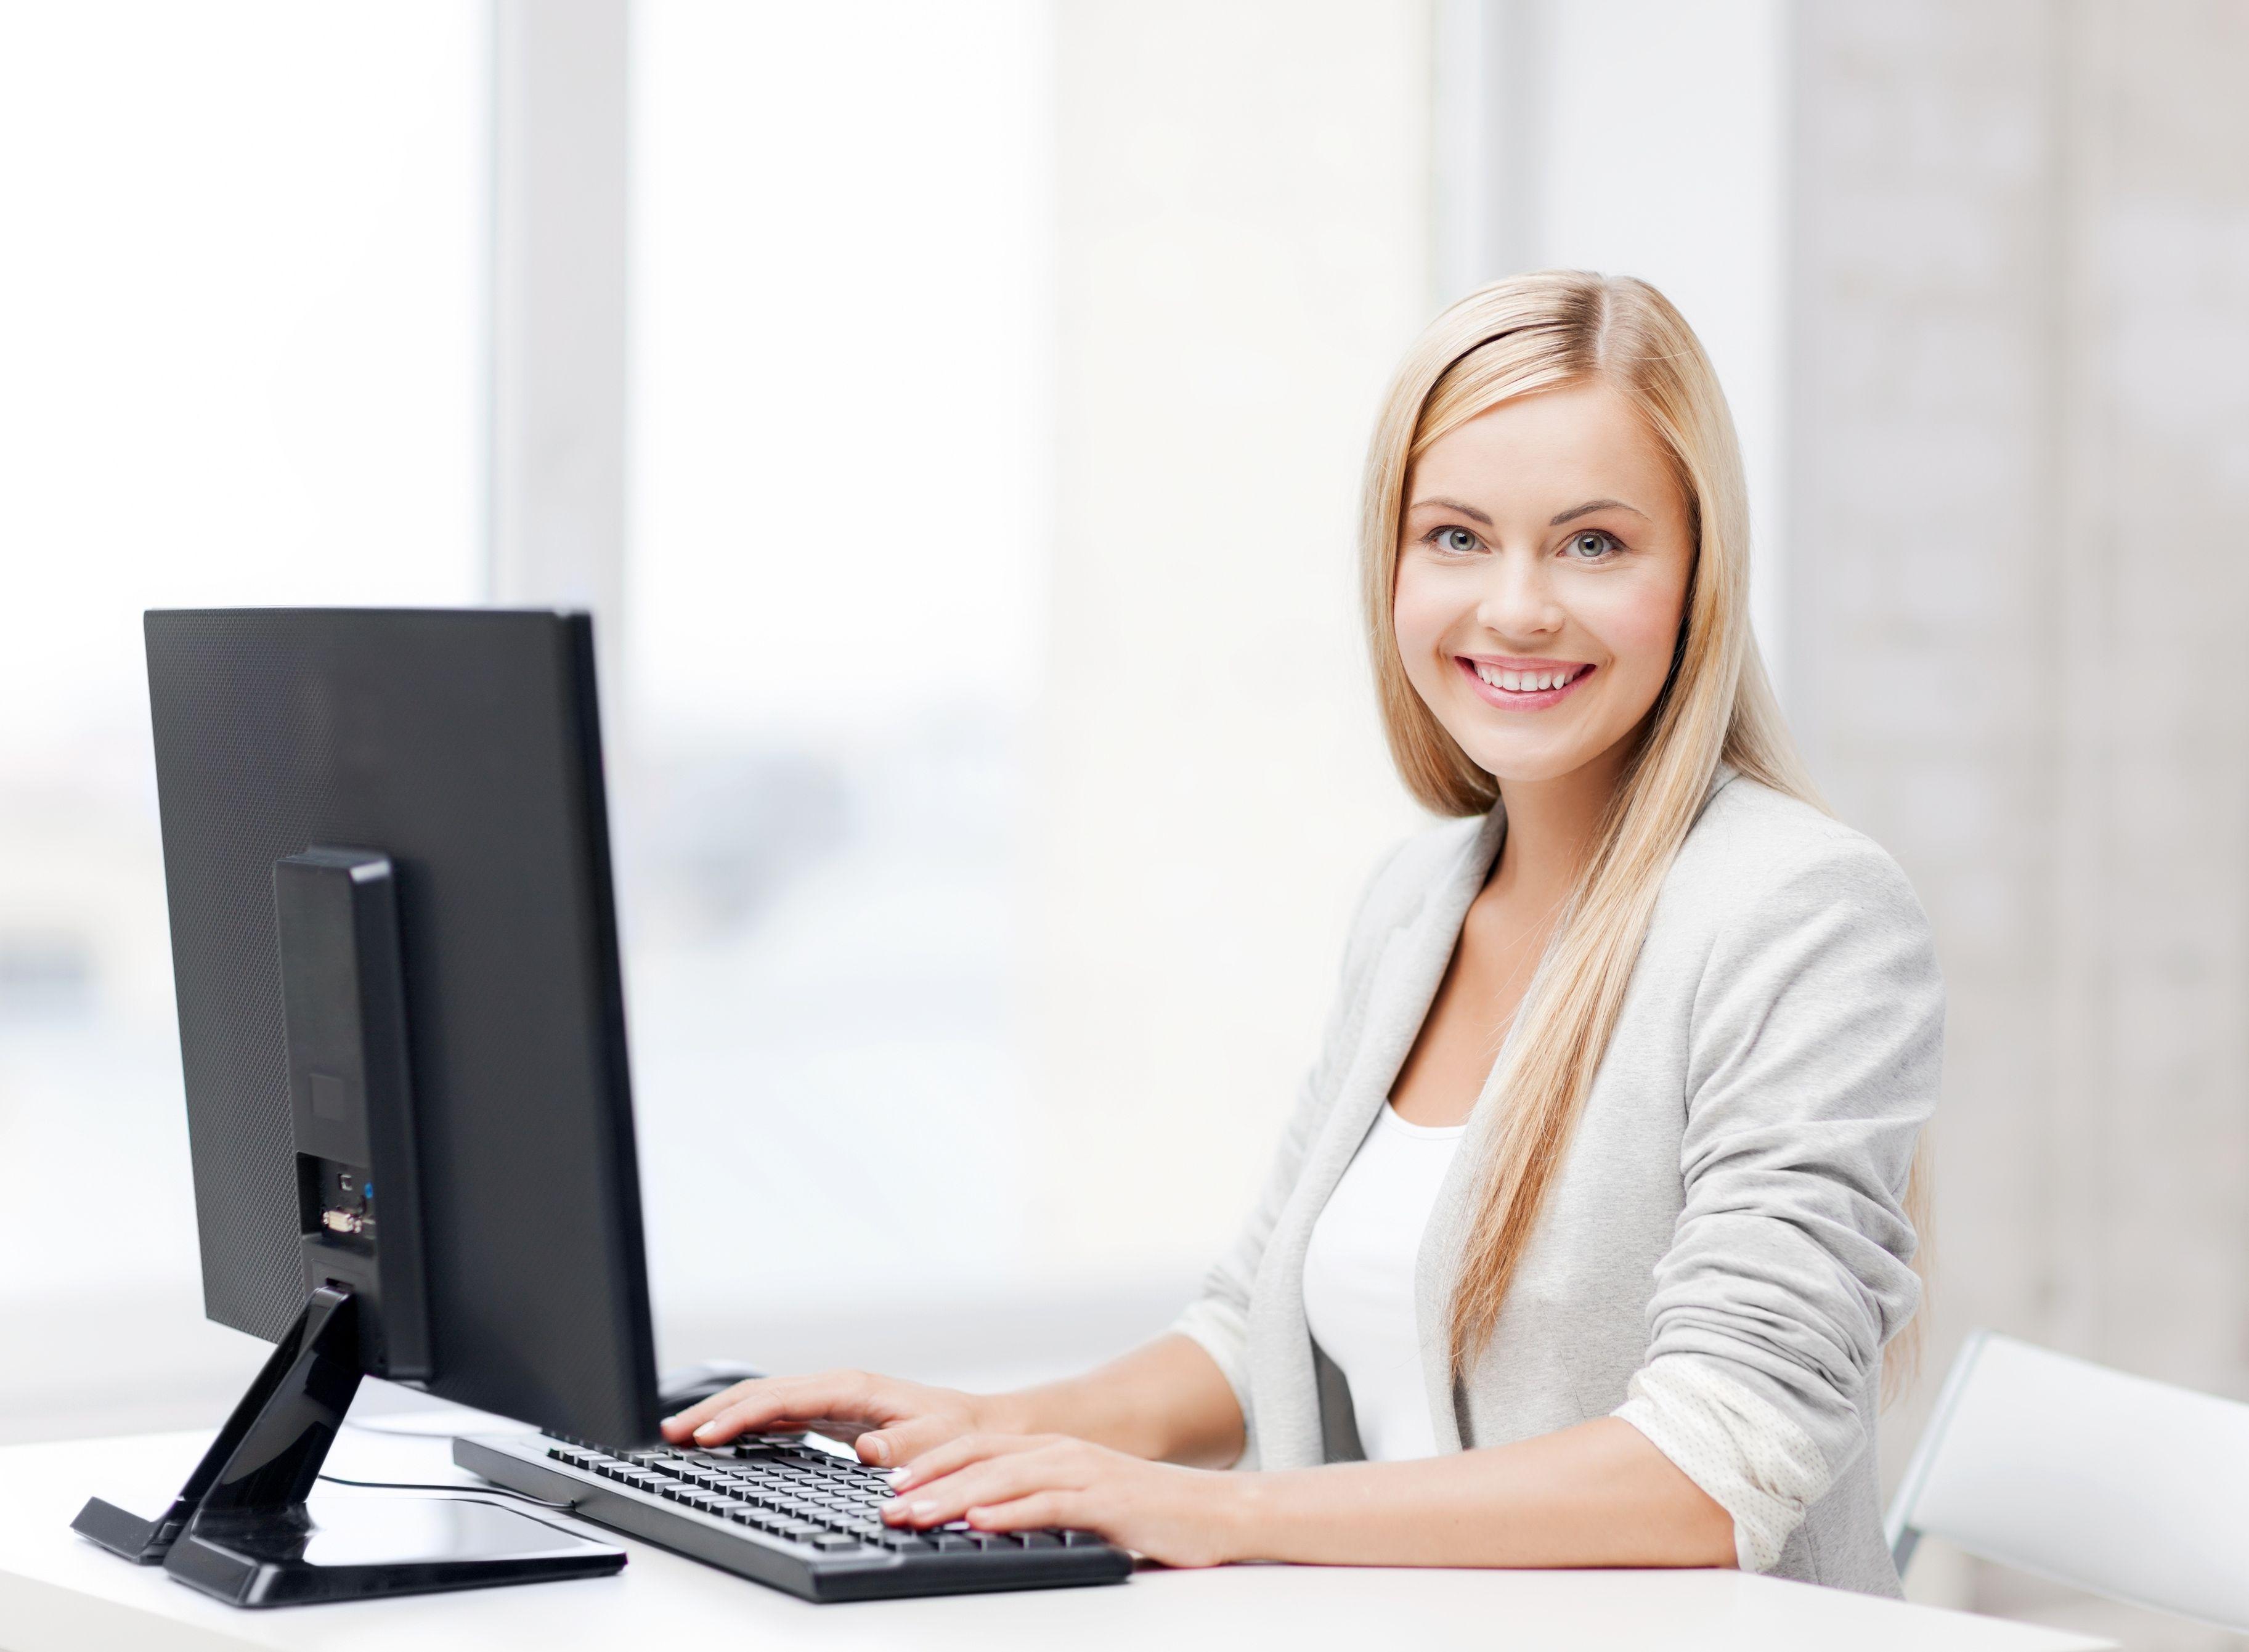 7 Best Ways to Get Ahead at Work